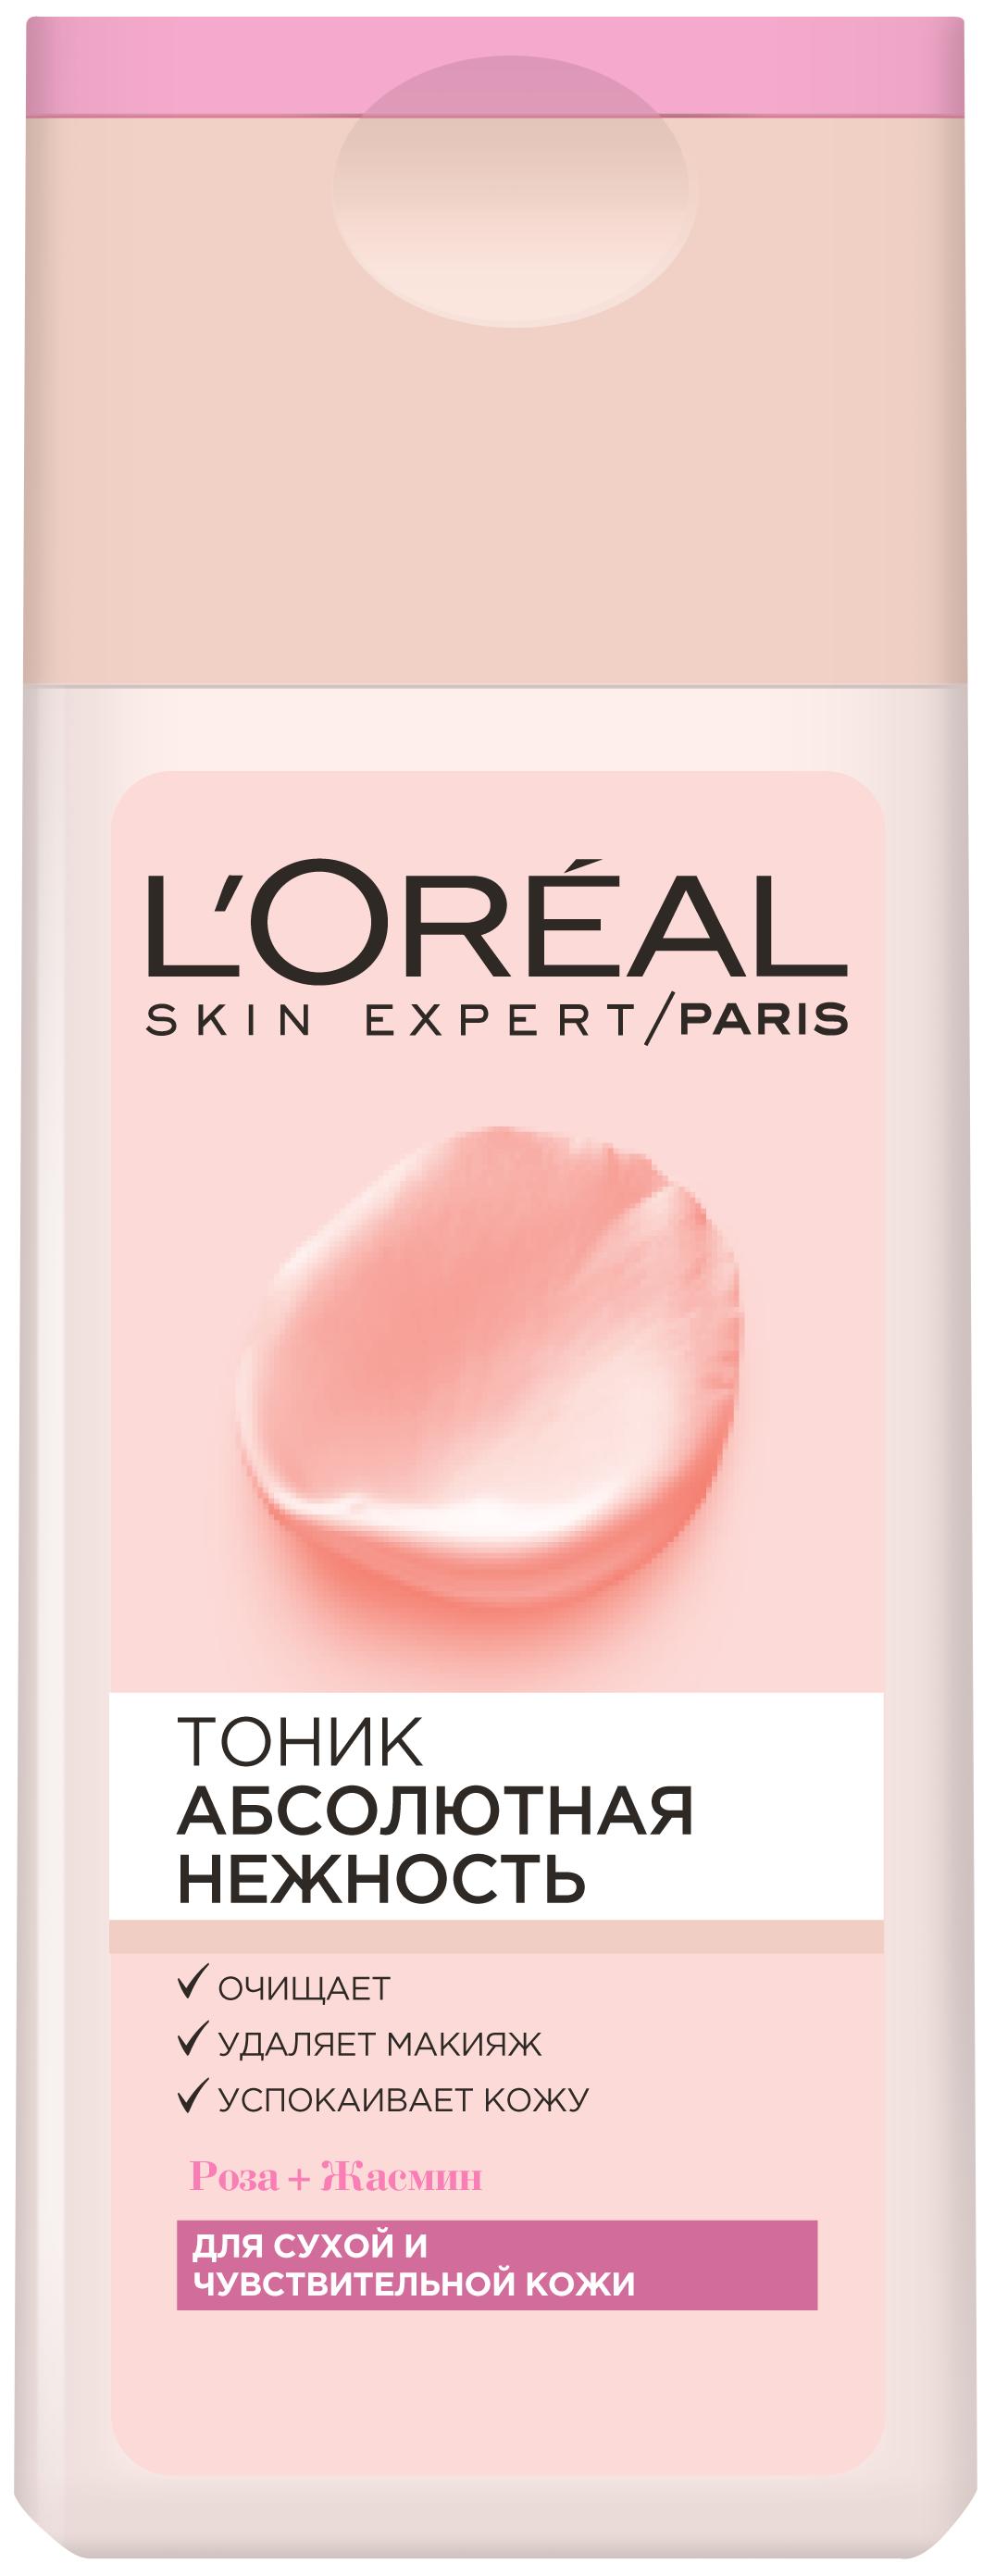 Тоник для лица L\'Oreal Paris DERMO-EXPERTISE Абсолютная нежность 200 мл